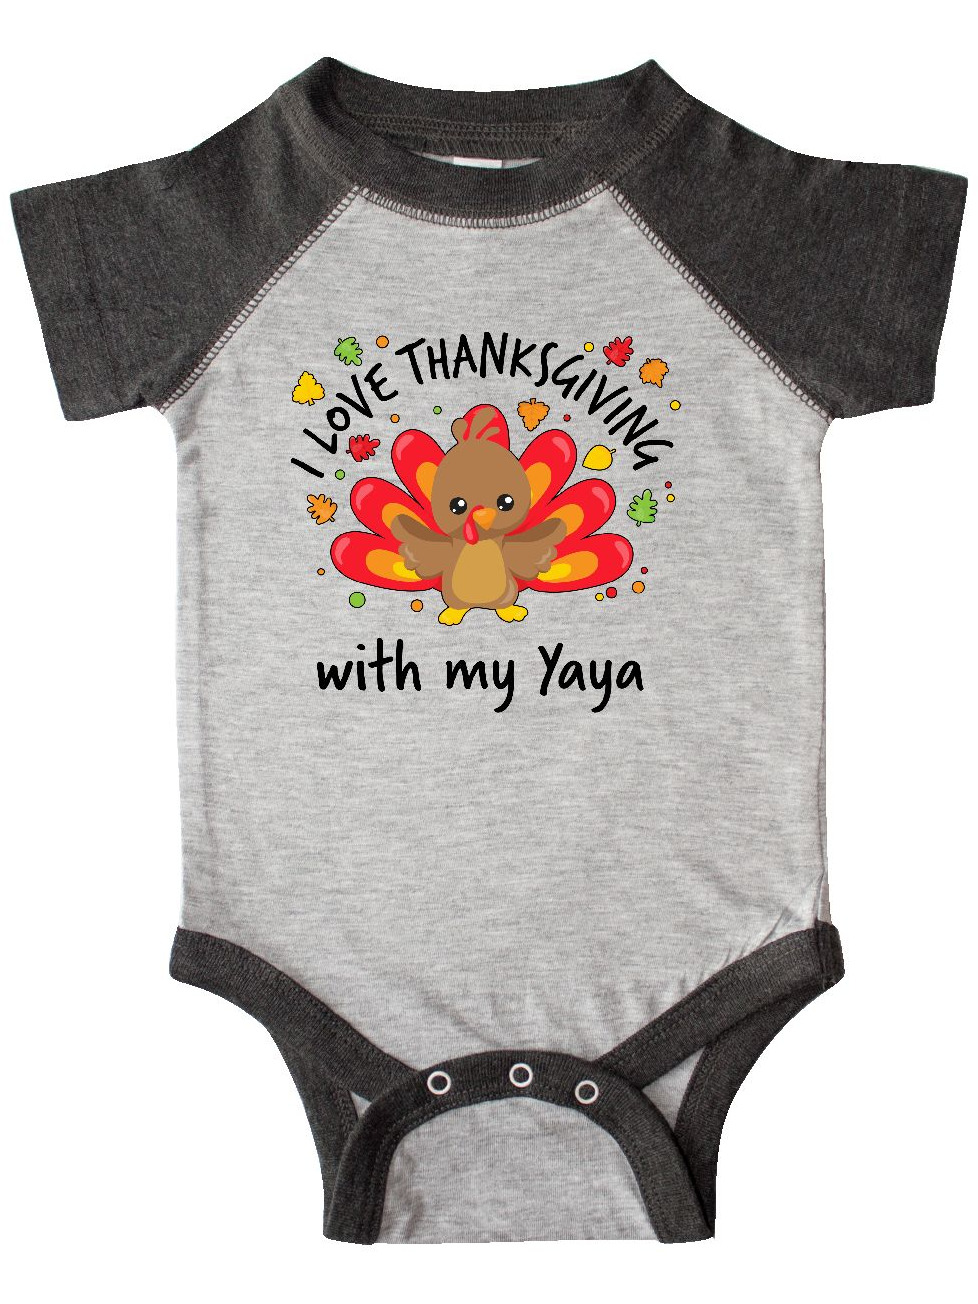 4 Preemie and Newborn Infant Sizes Unisex Baby Happy Thanksgiving Clothing Set